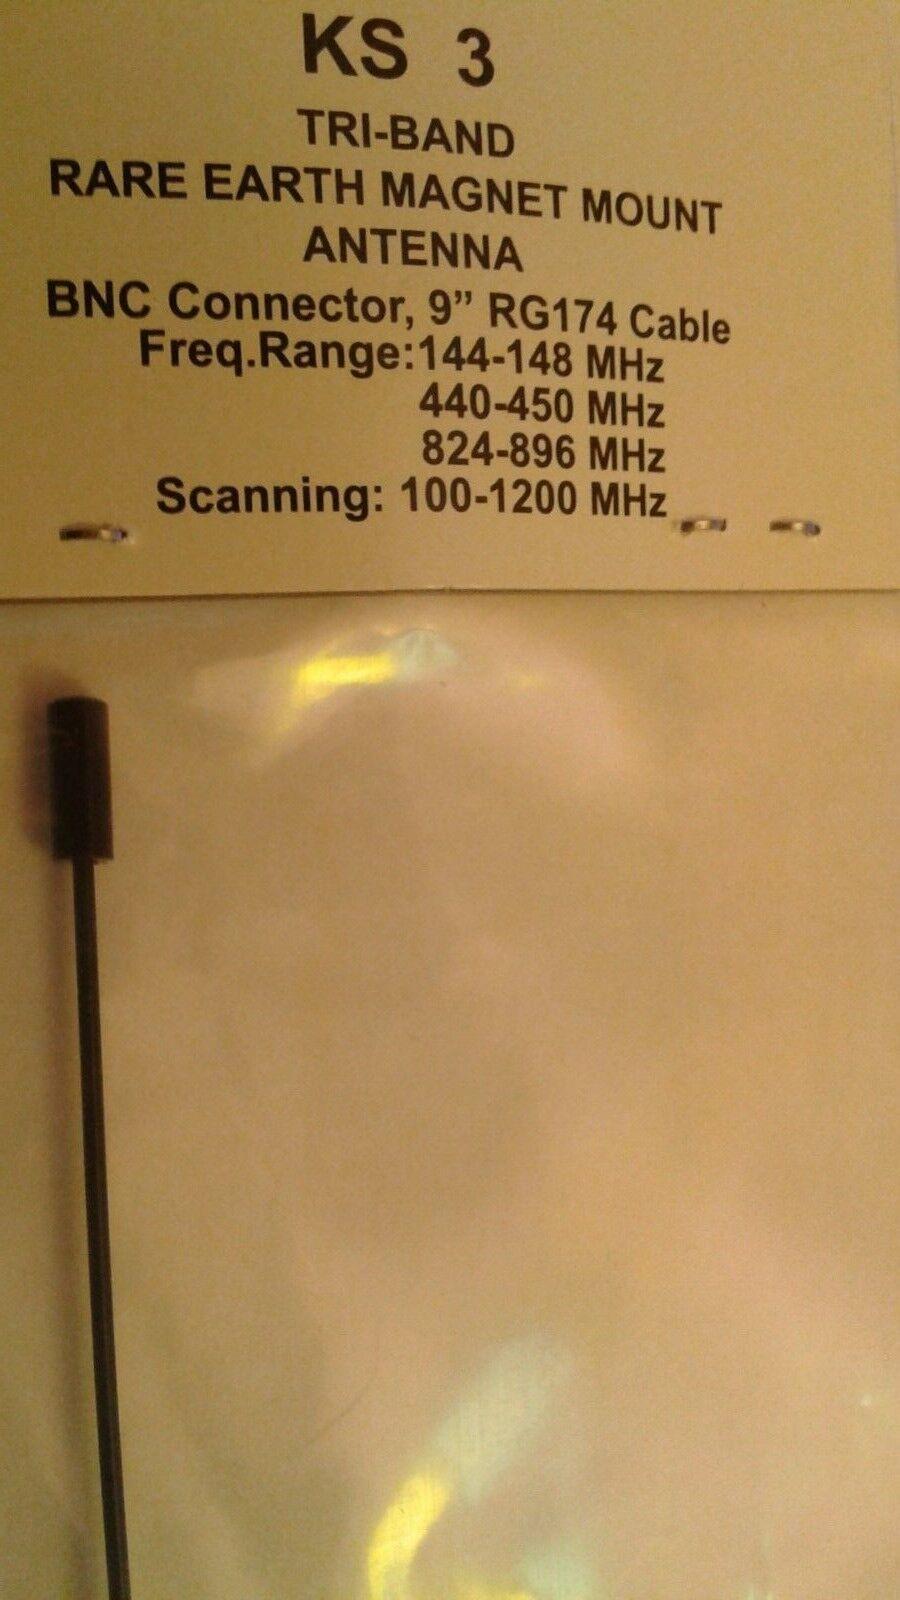 Workman ALL Band HAM Radio Antenna Rare Earth Magnet W/CABLE BNC Connector UHF VHF KS3